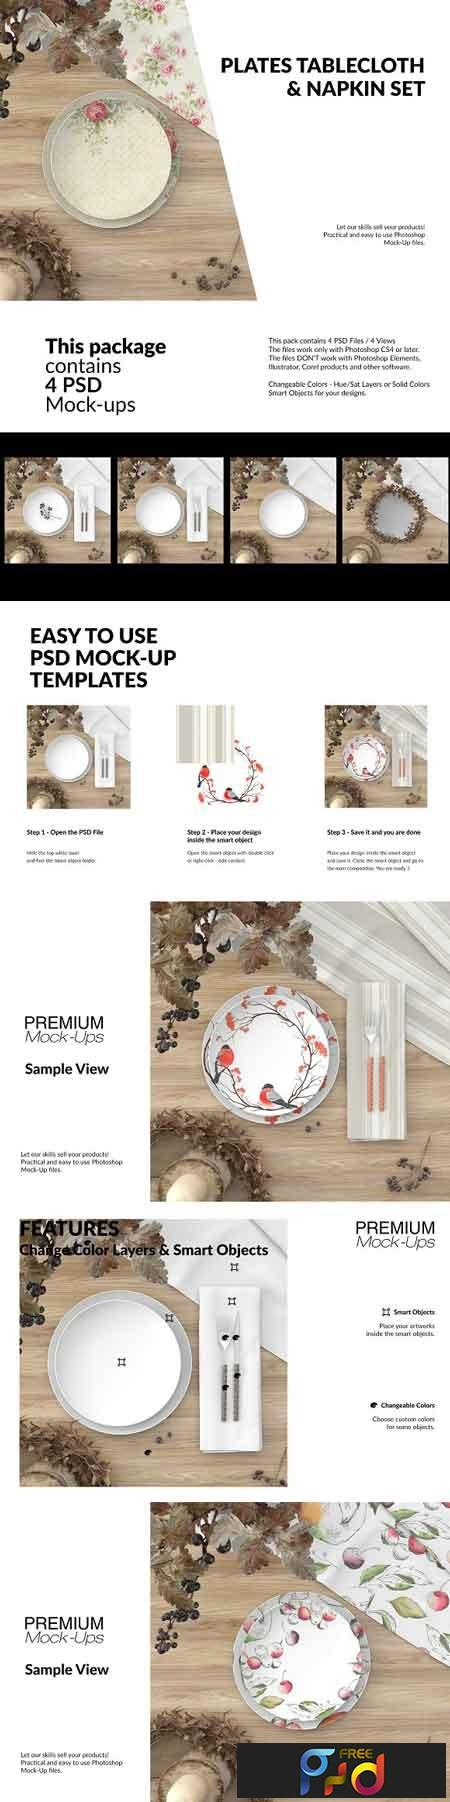 Plates, Tablecloth & Napkin Set 2946768 1